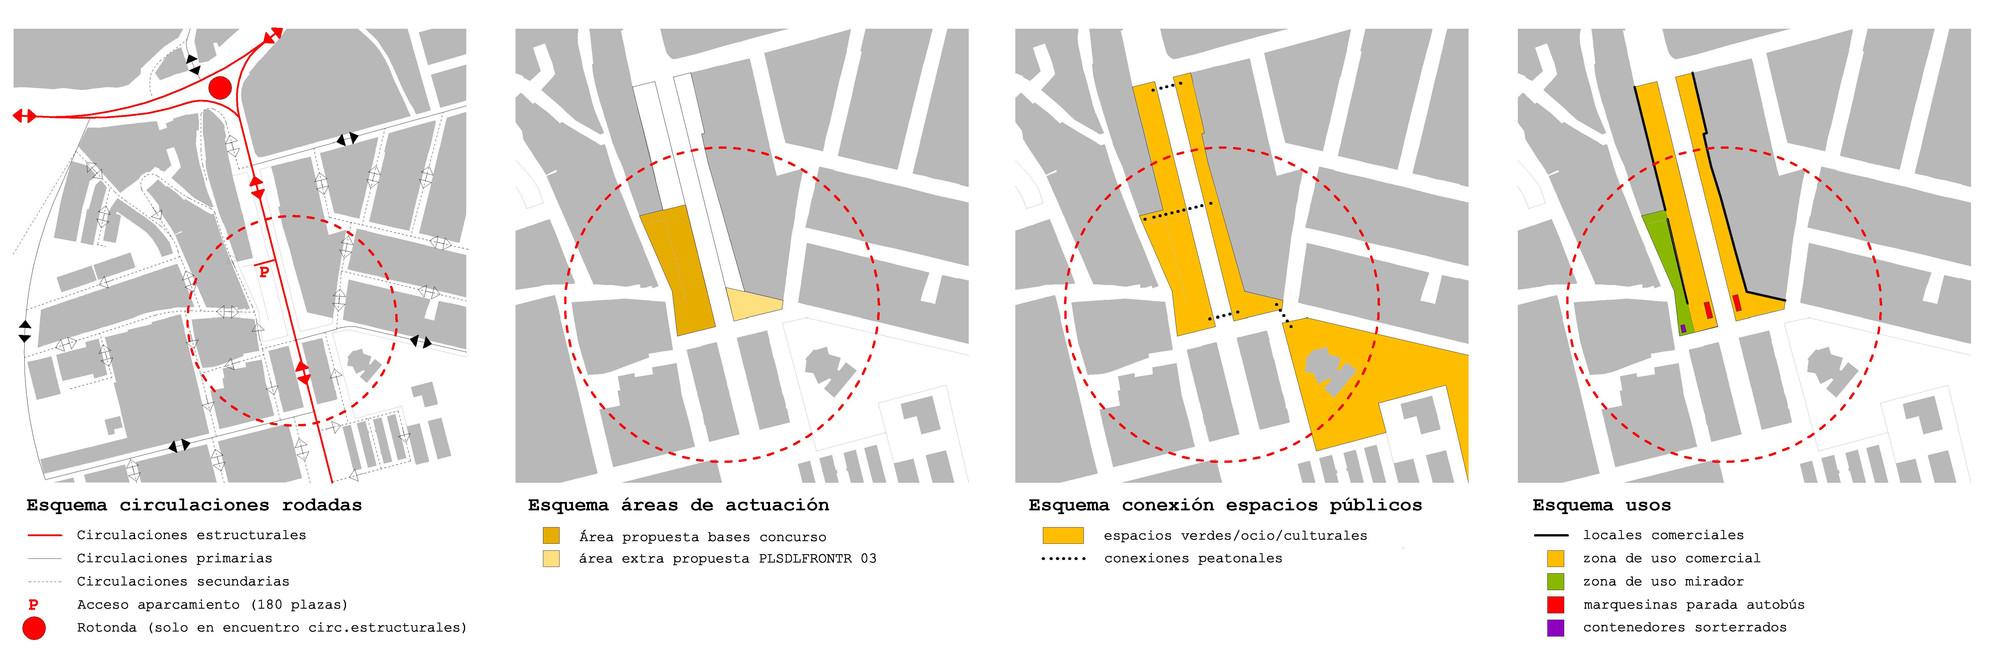 Propuesta urbana